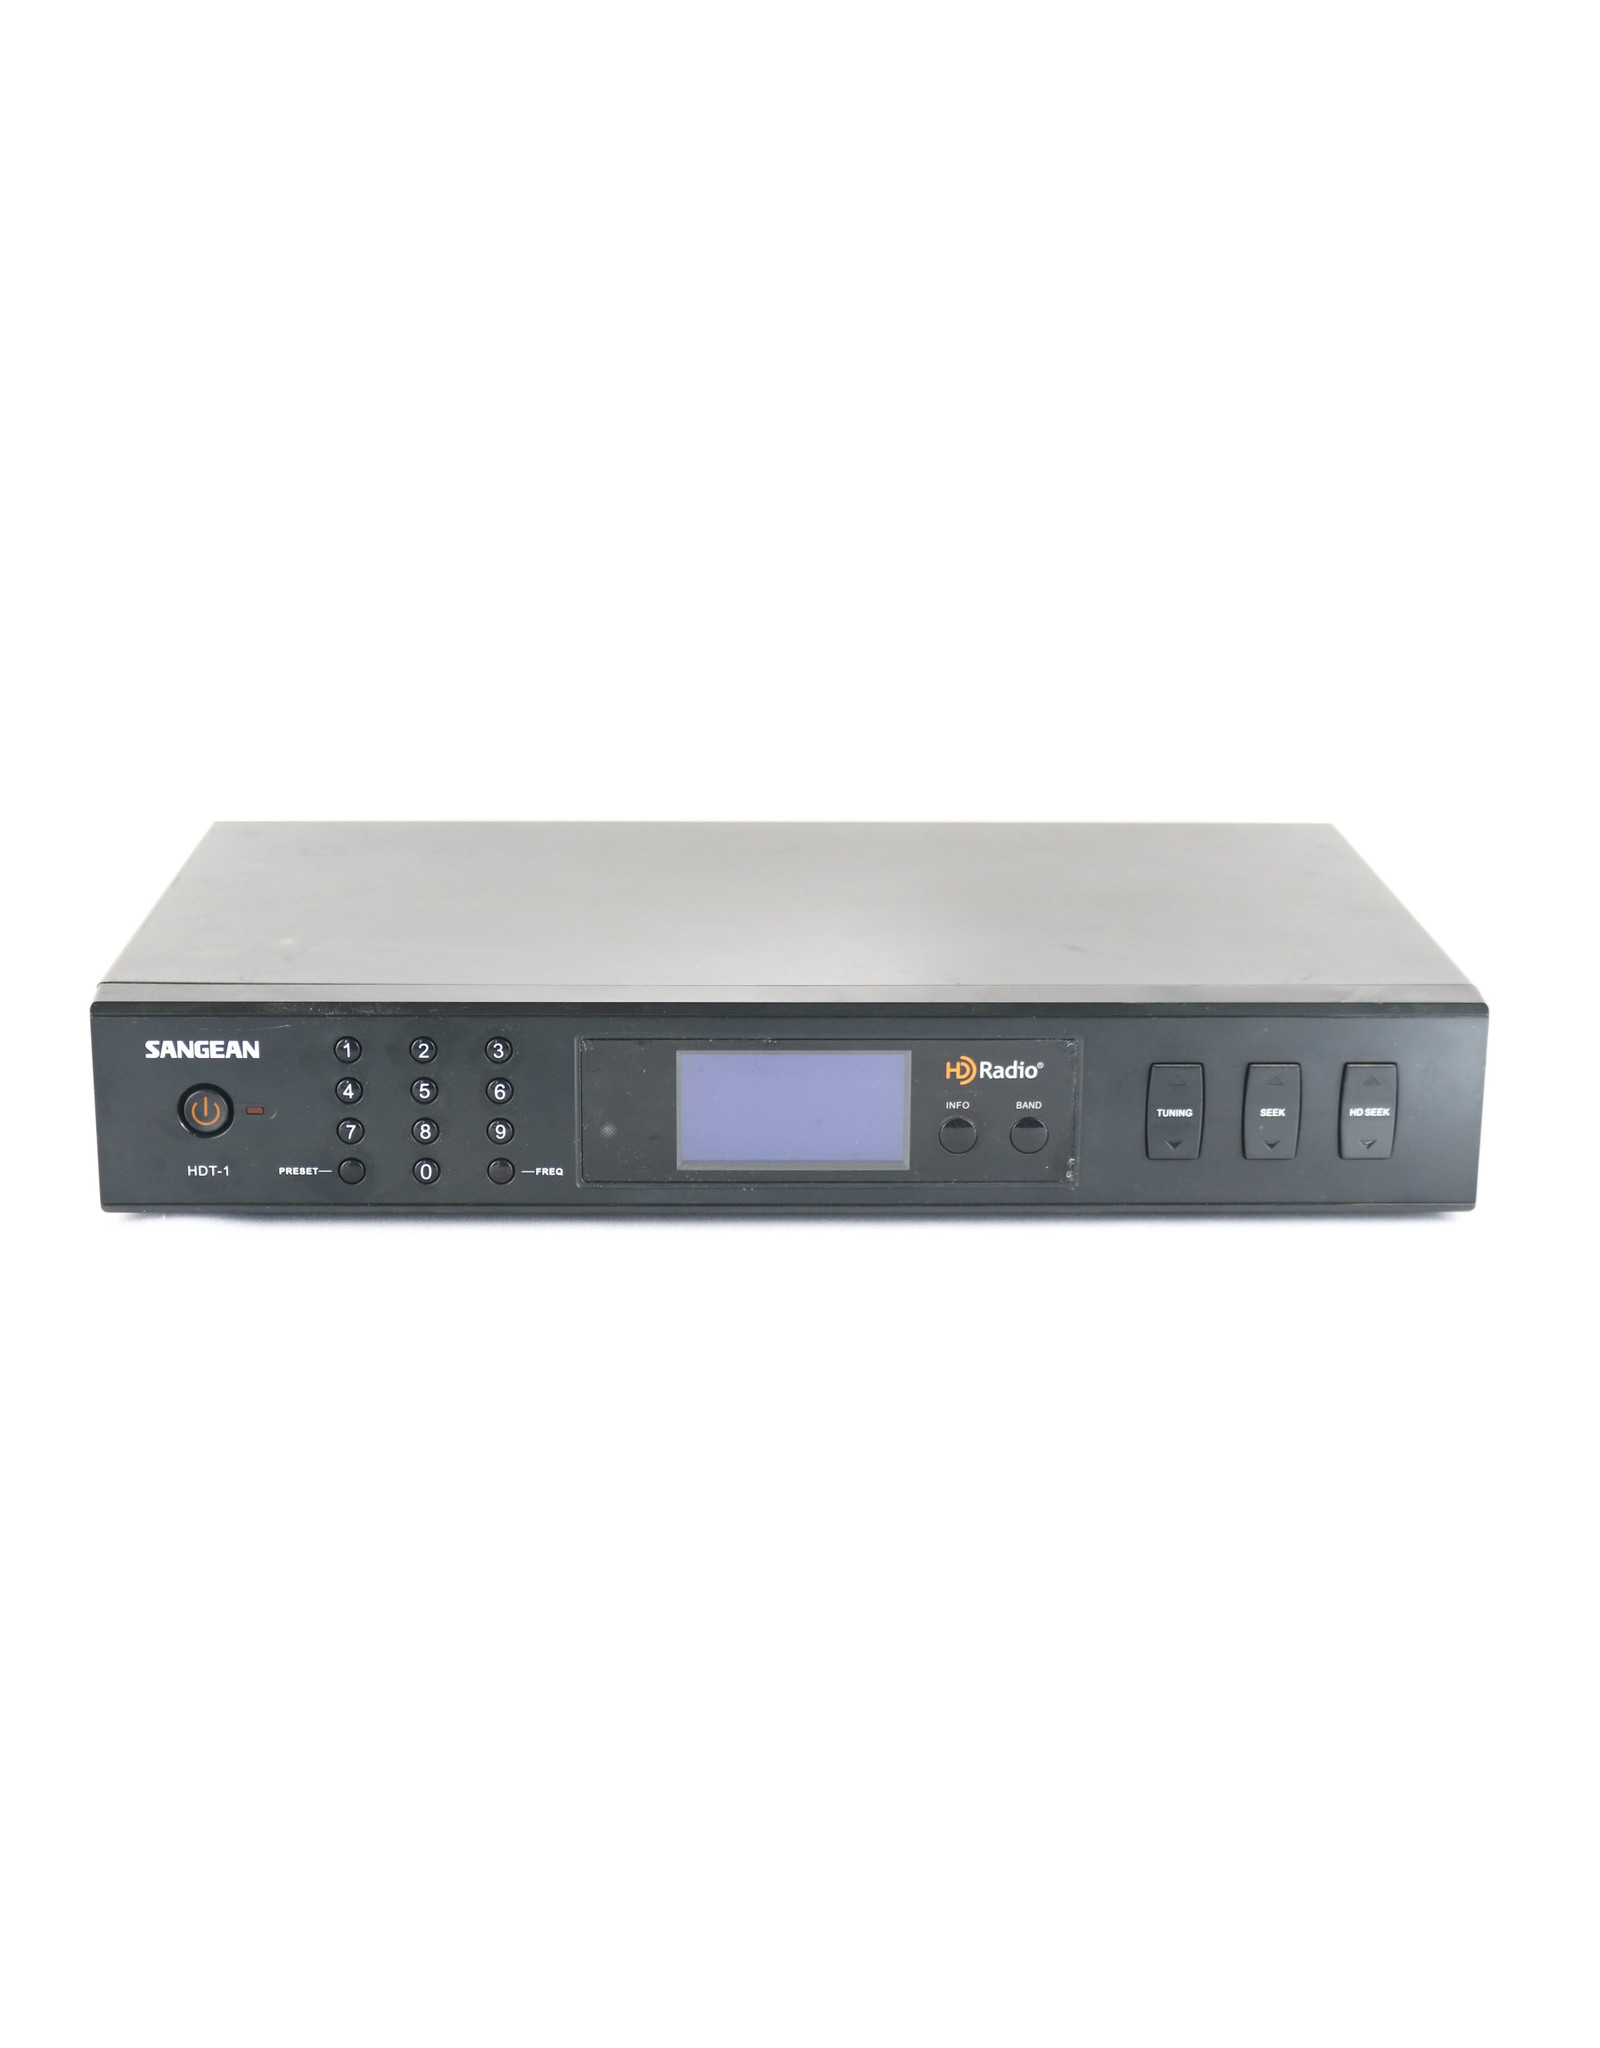 Sangean Sangean HDT-1 HD Radio Tuner USED